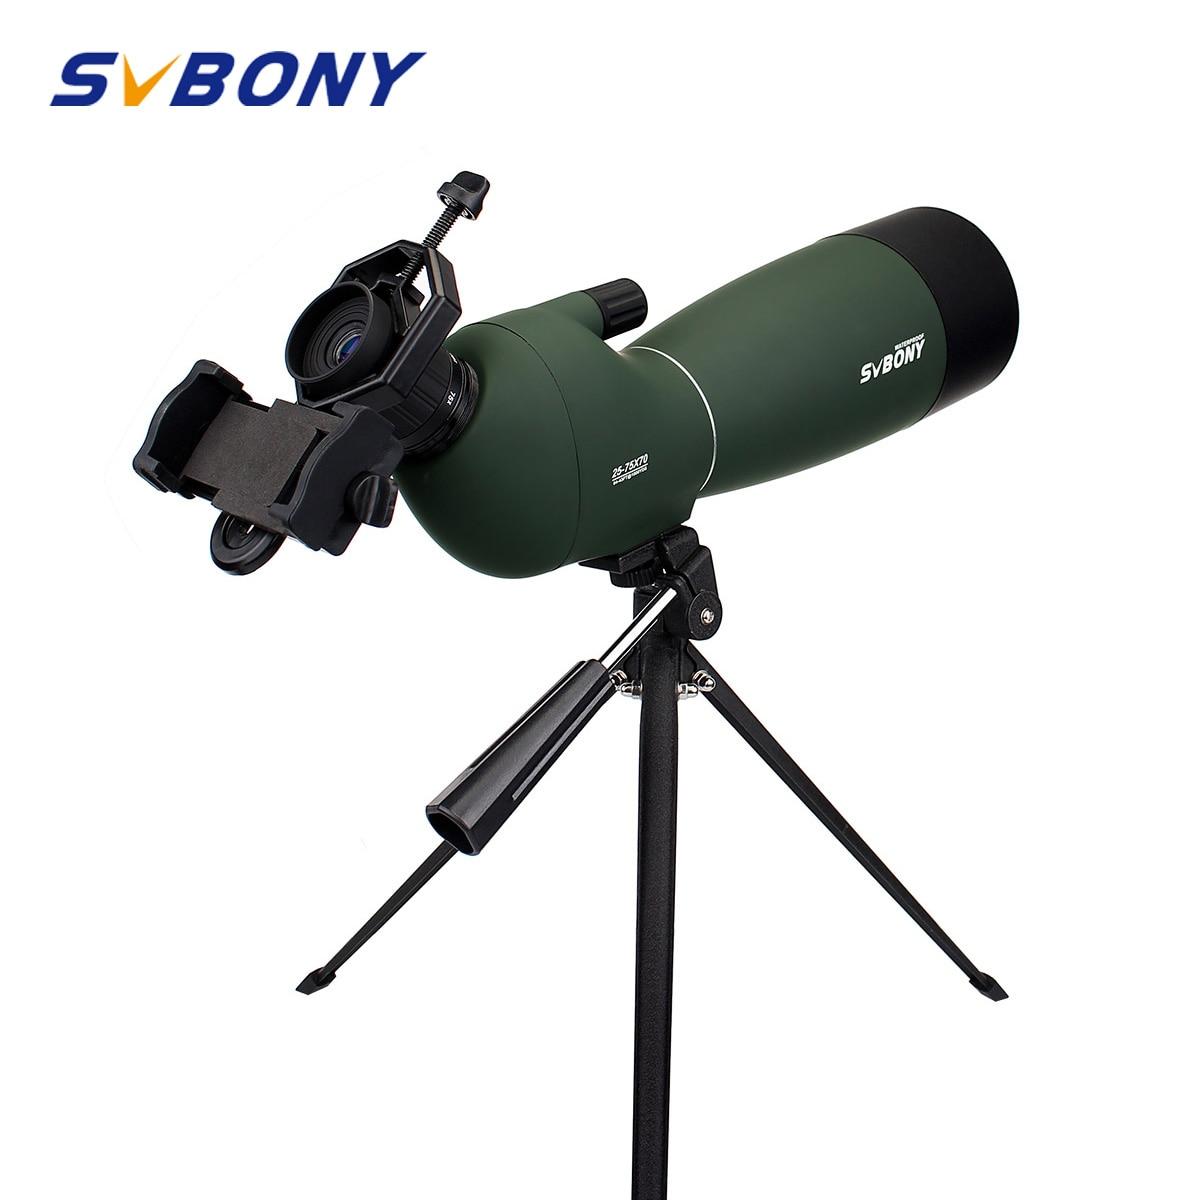 Svbony SV28 50/60/70 Mm Spotting Scope Zoom Teleskop Tahan Air Birdwatch Berburu Bermata & Universal Ponsel Adaptor mountF9308